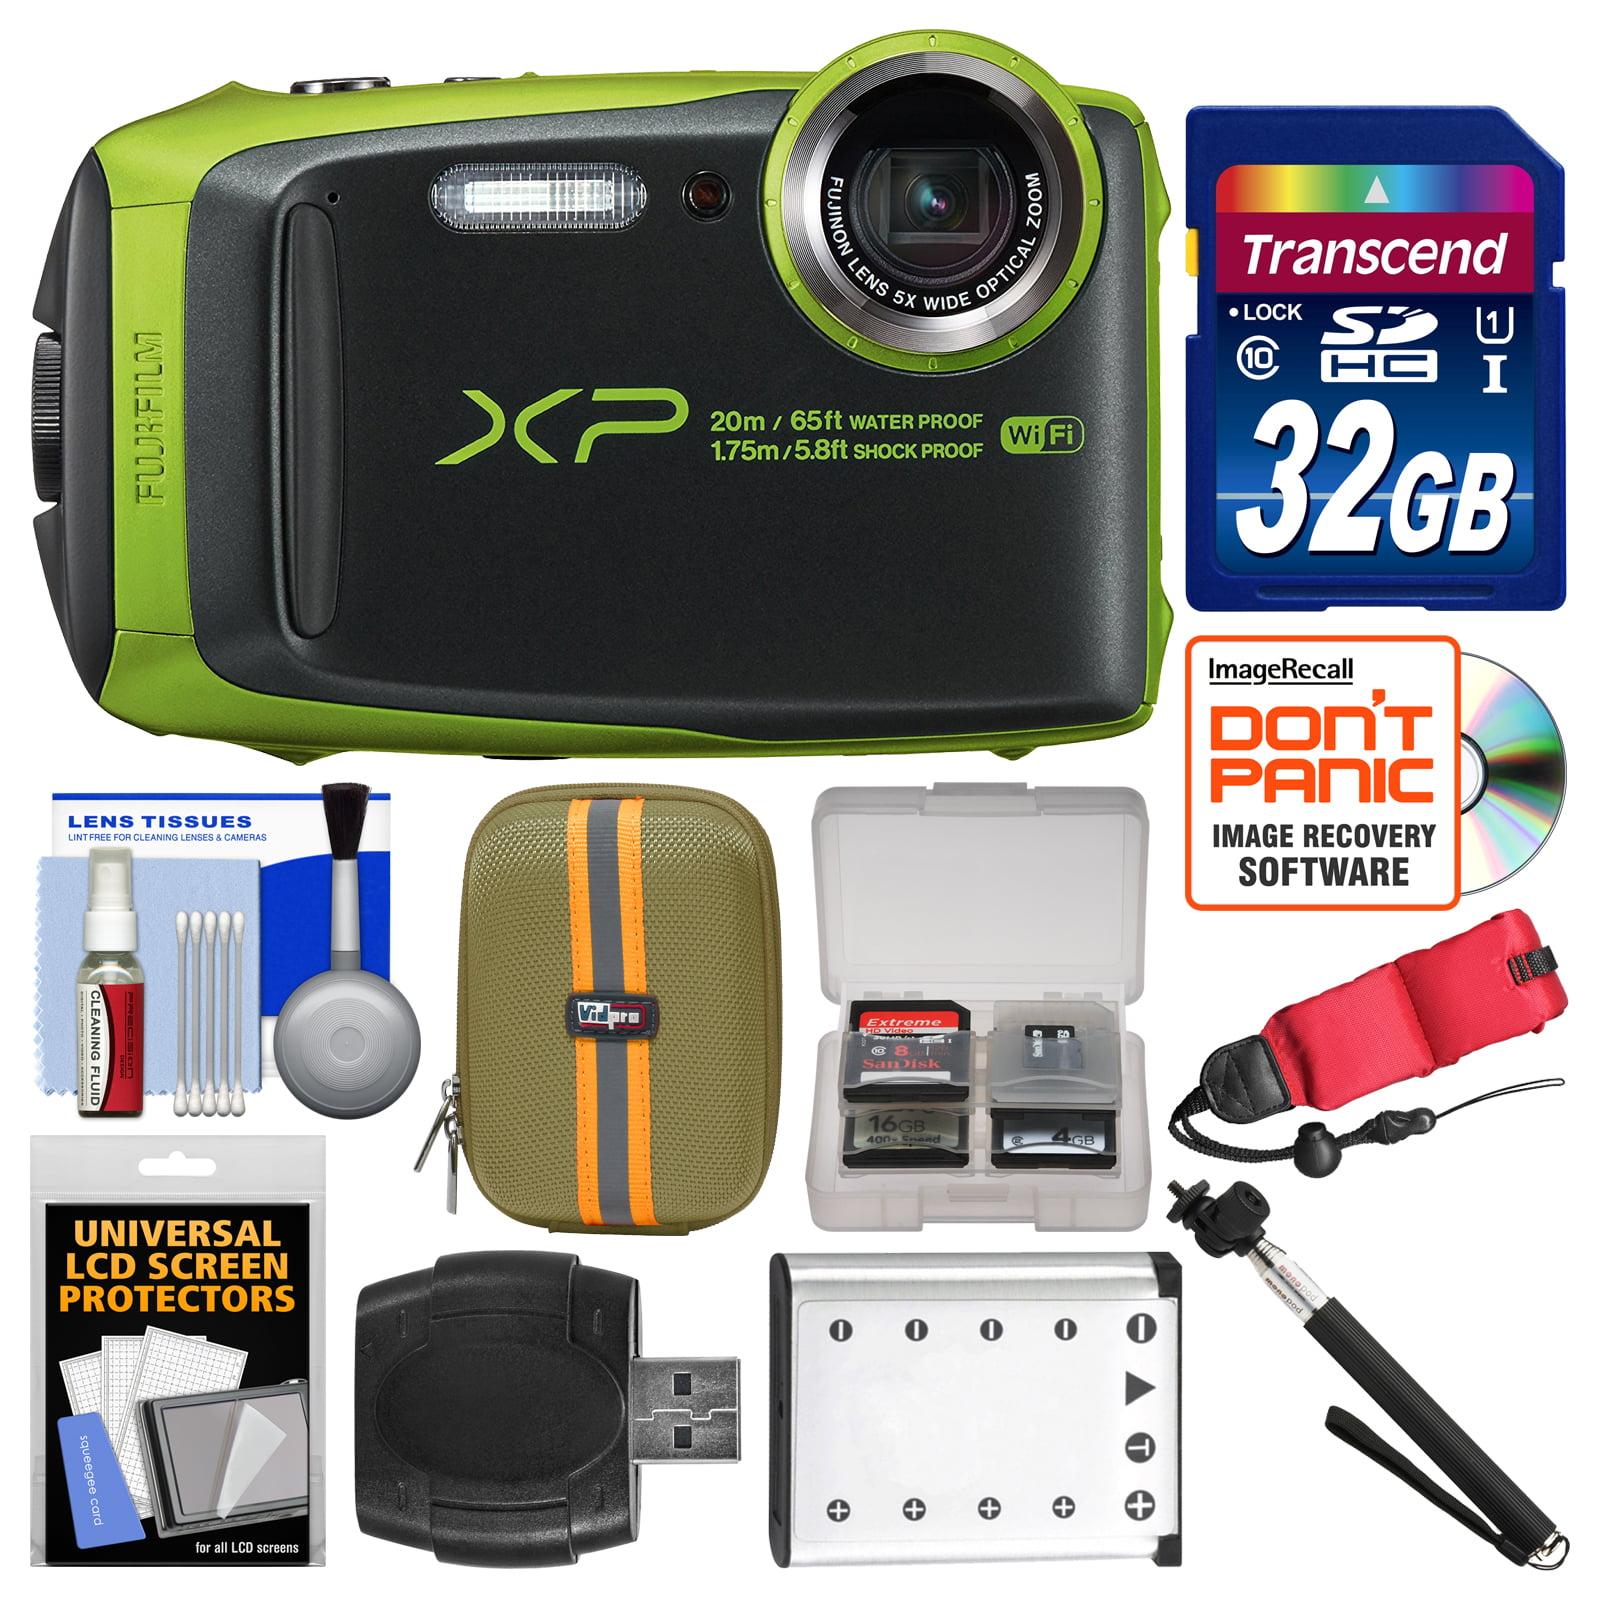 FujiFilm FinePix XP120 Shock & Waterproof Wi-Fi Digital Camera (Lime Green) with 32GB Card + Case + Battery + Selfie... by Fujifilm